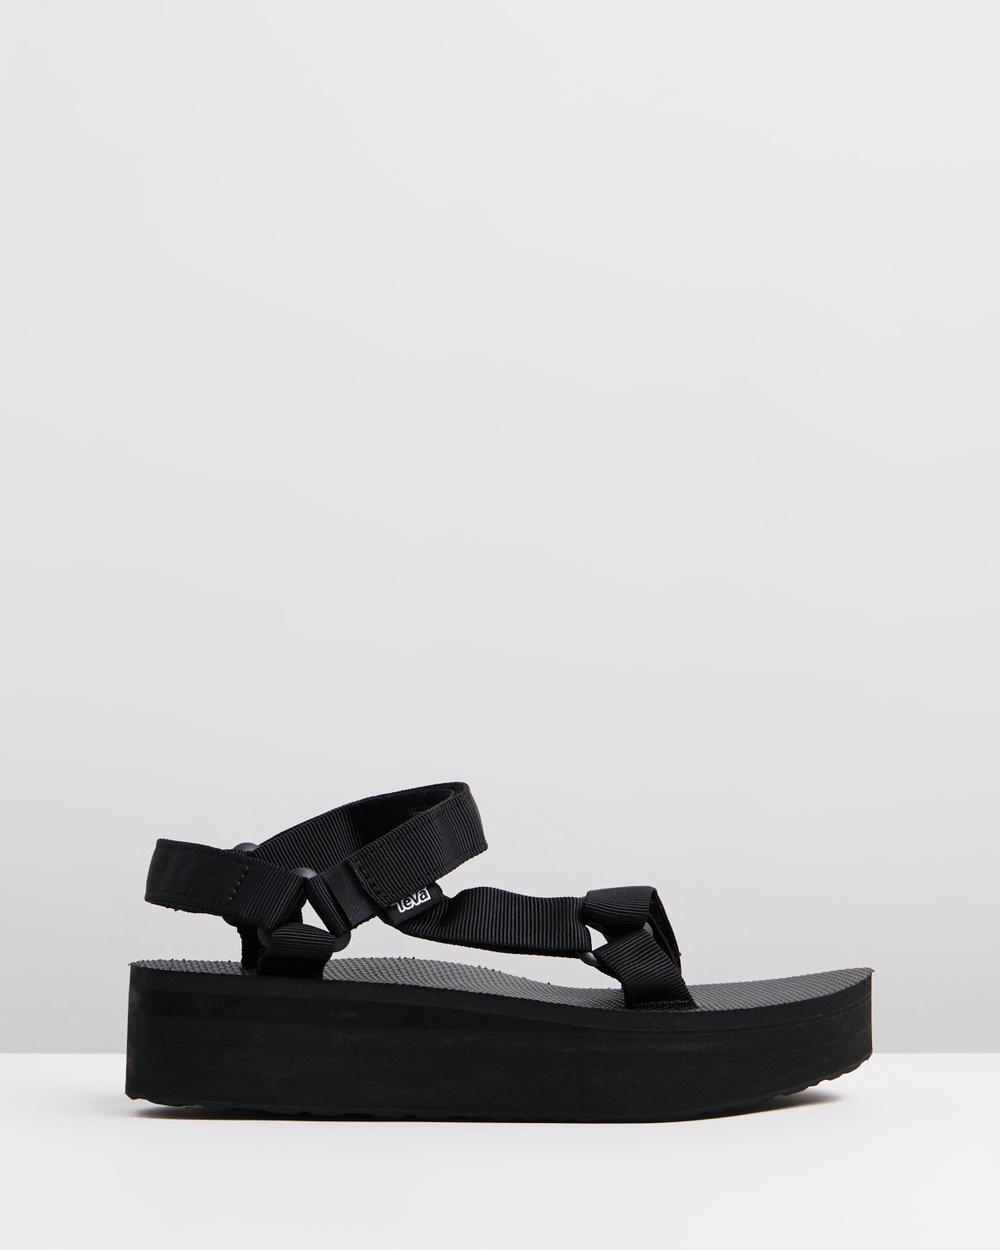 Teva Flatform Universal Womens Sandals Black